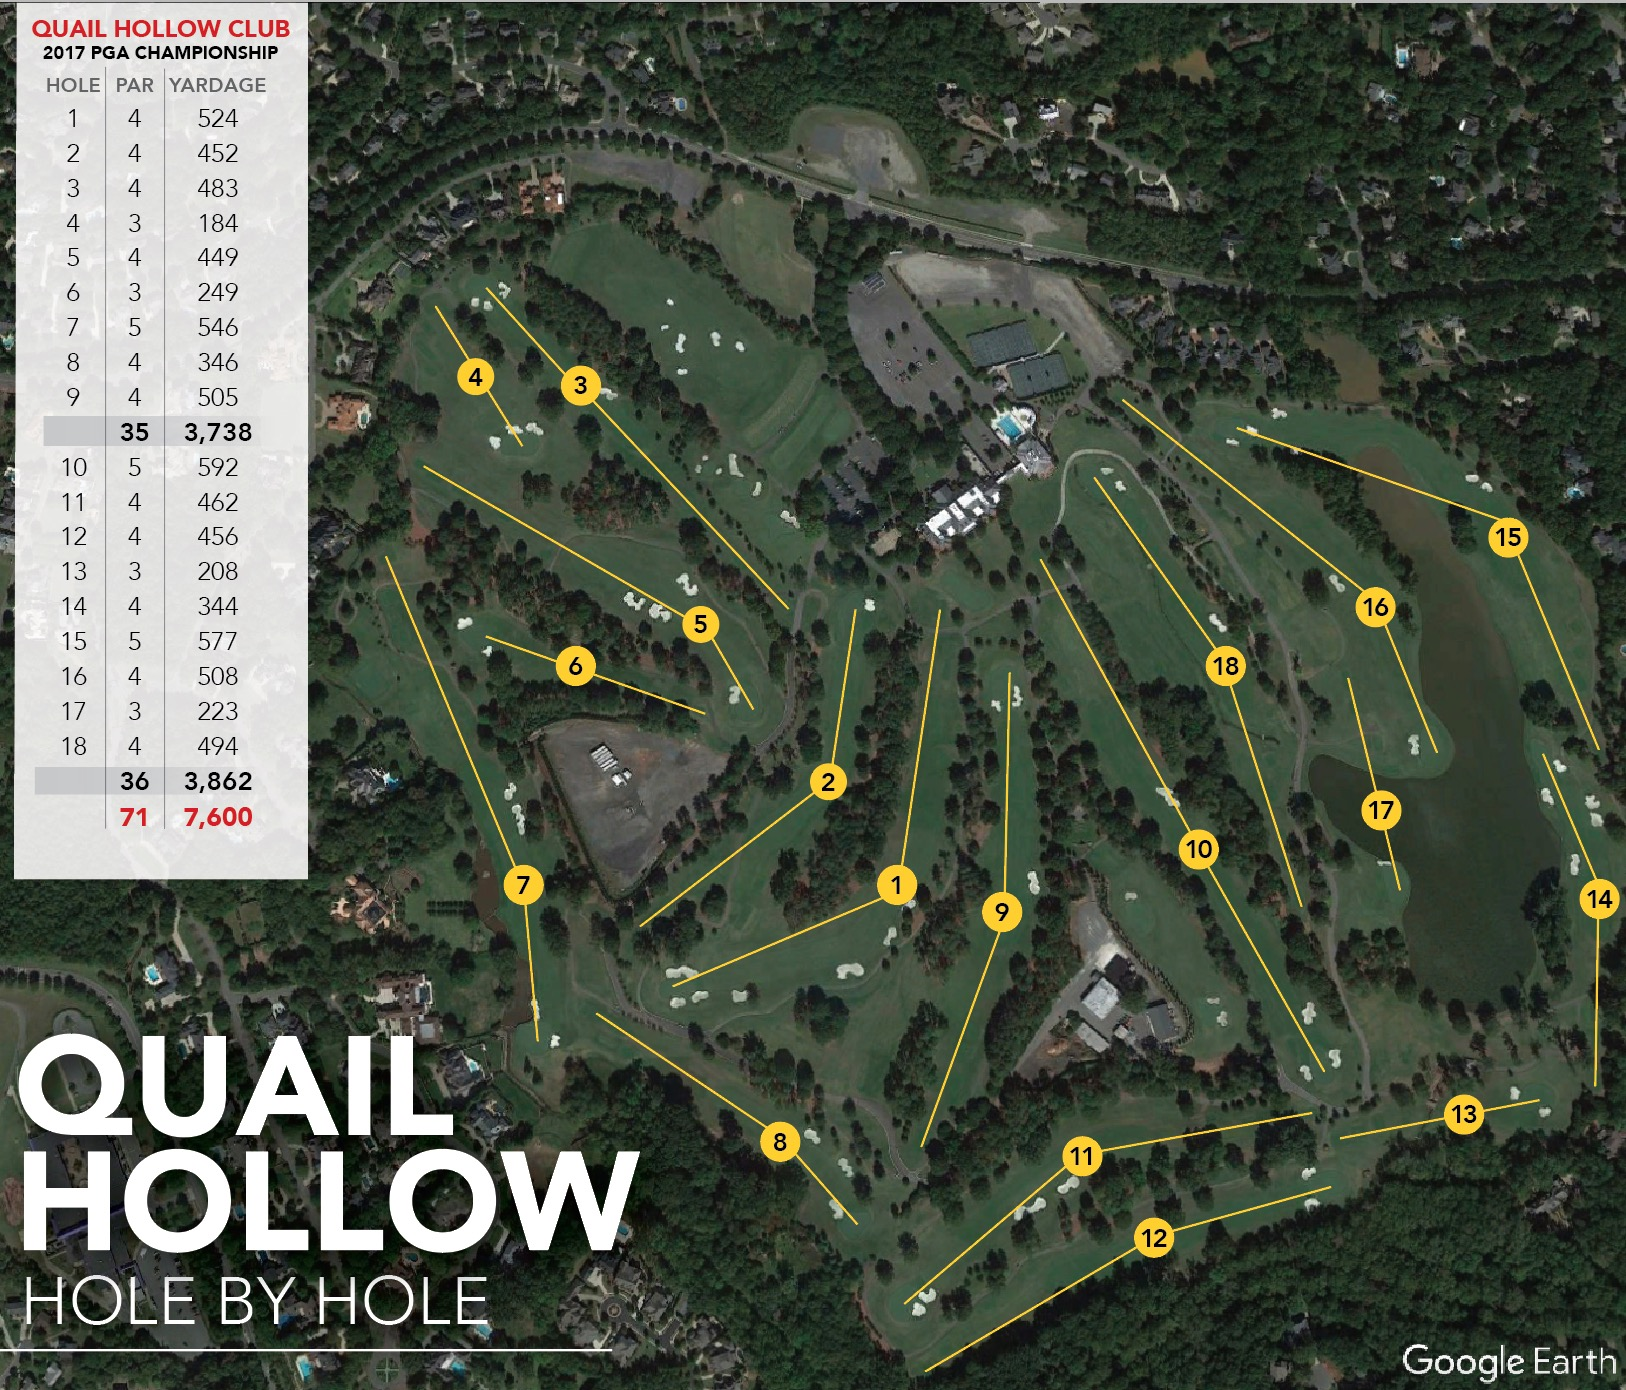 PGA Championship Quail Hollow Hole-By-Hole